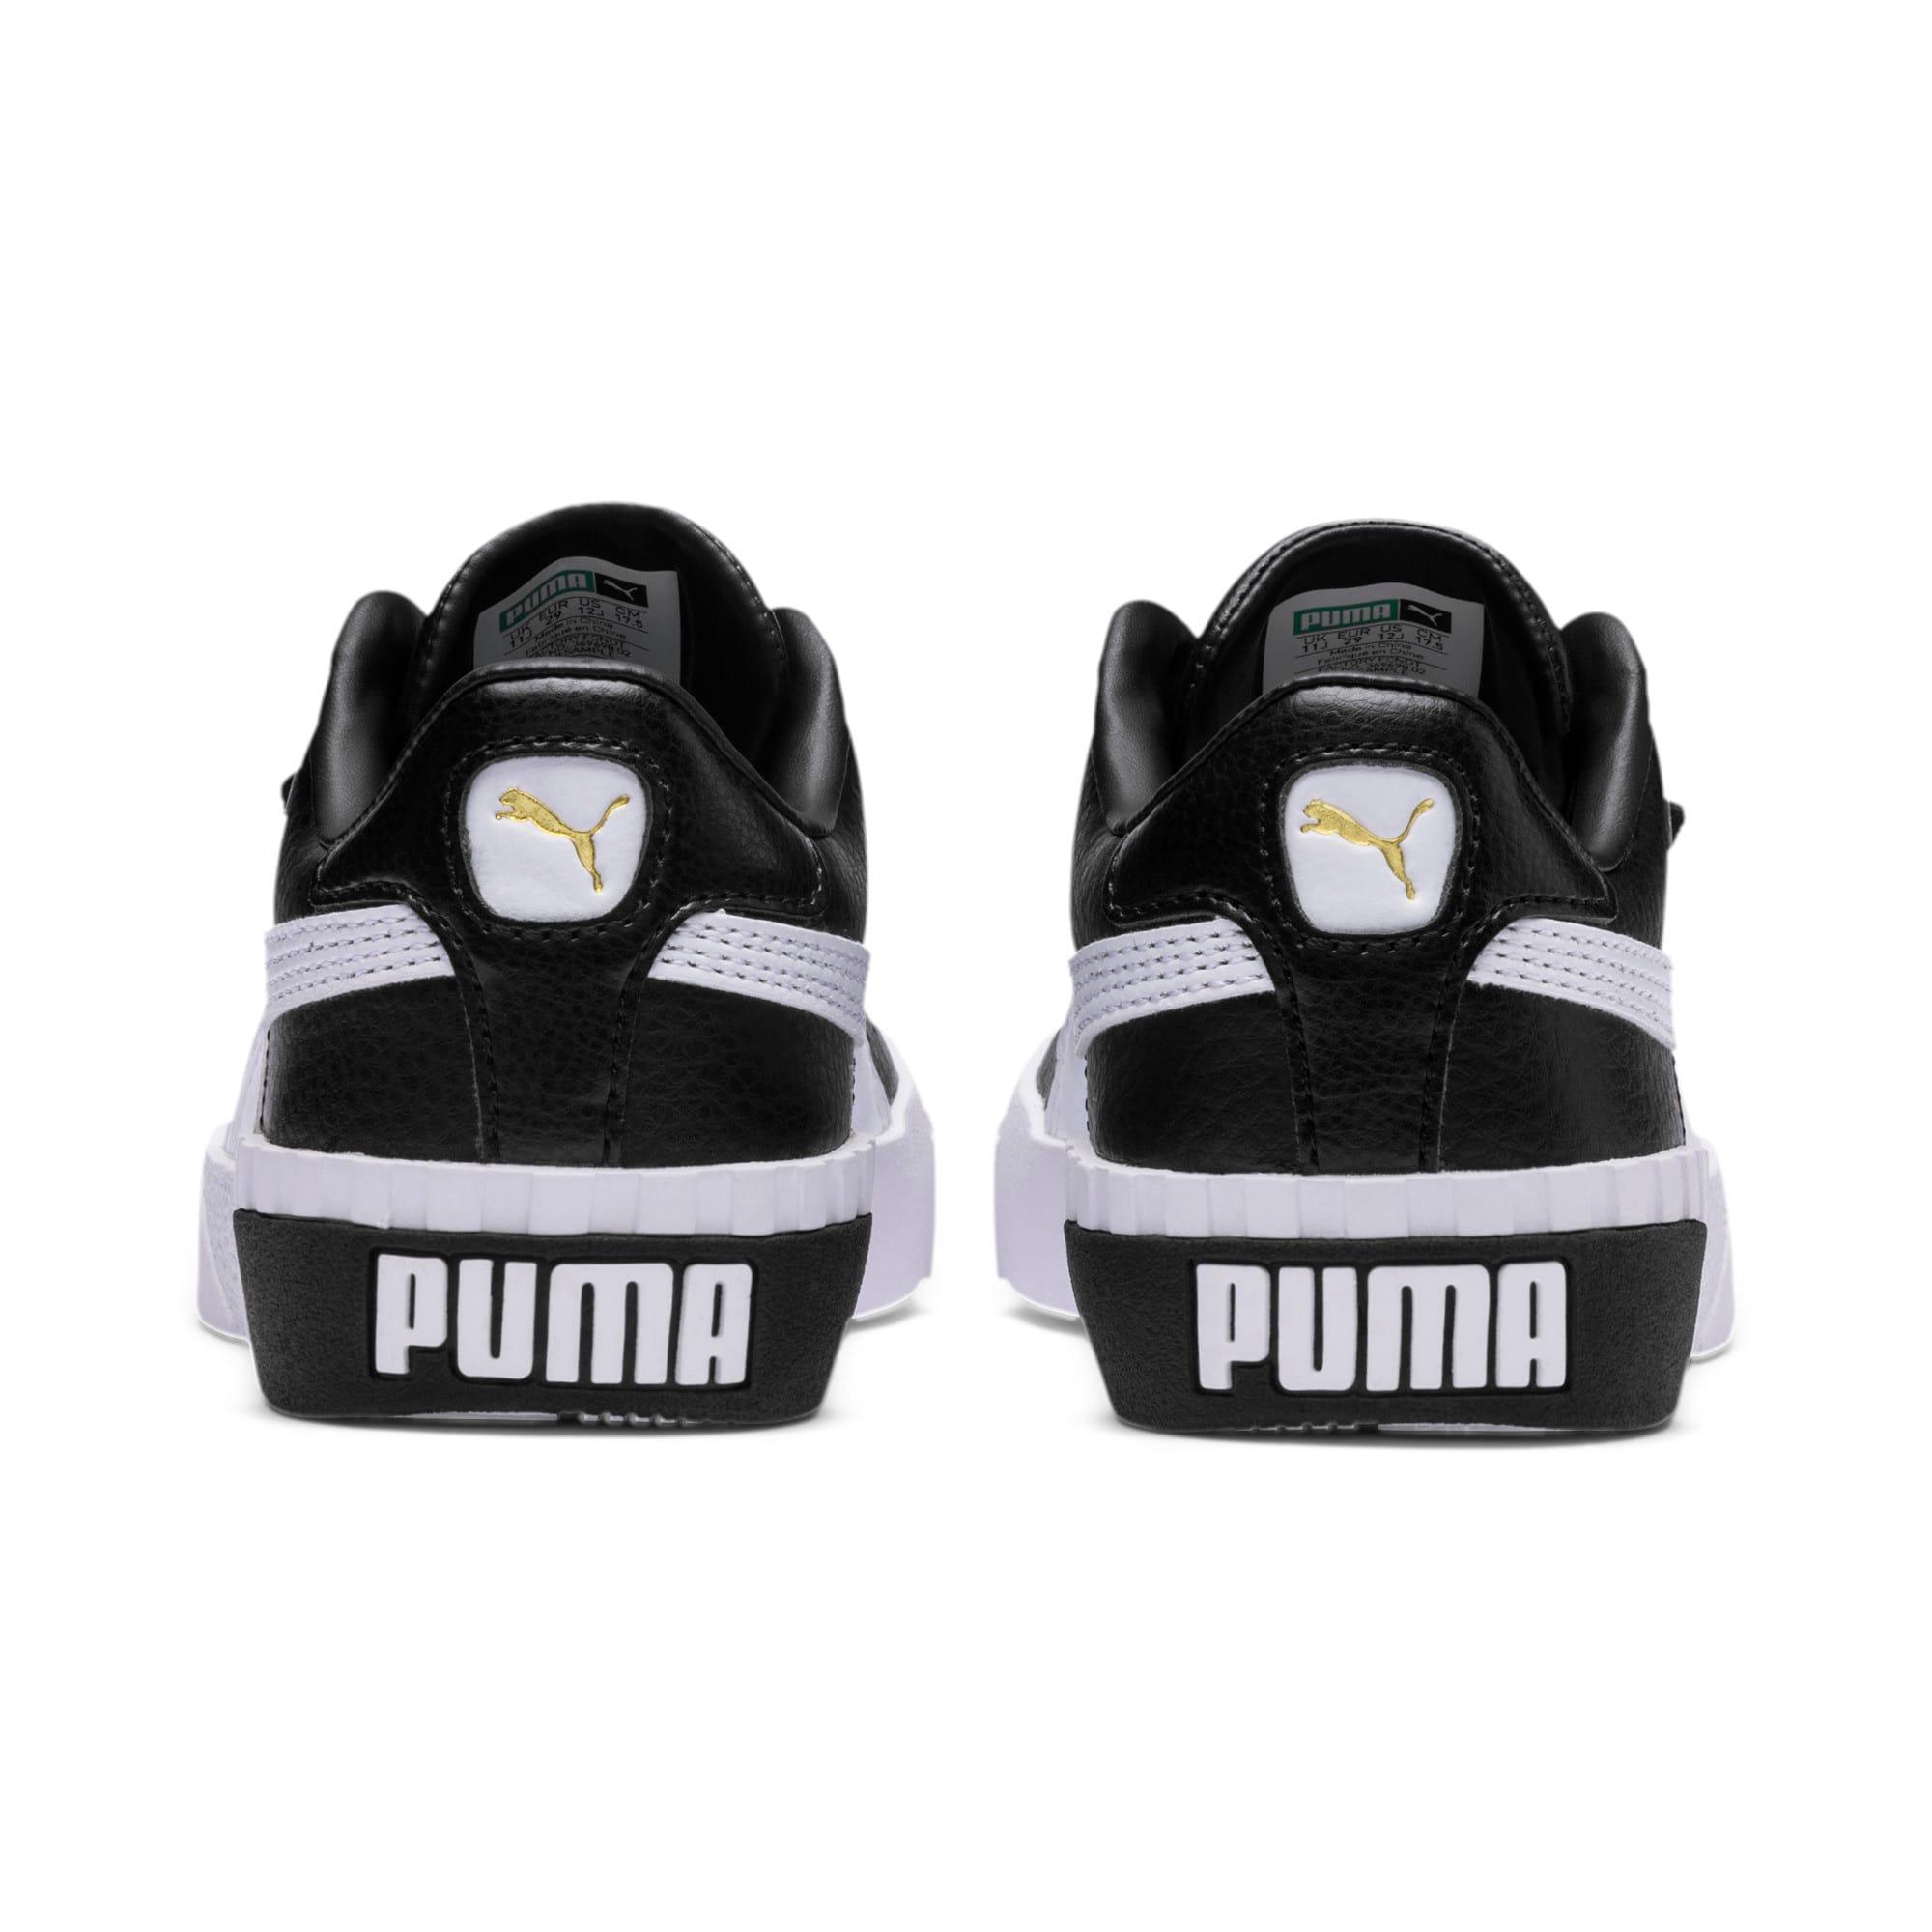 Imagen en miniatura 3 de Zapatillas Cali de niña, Puma Black-Puma Team Gold, mediana